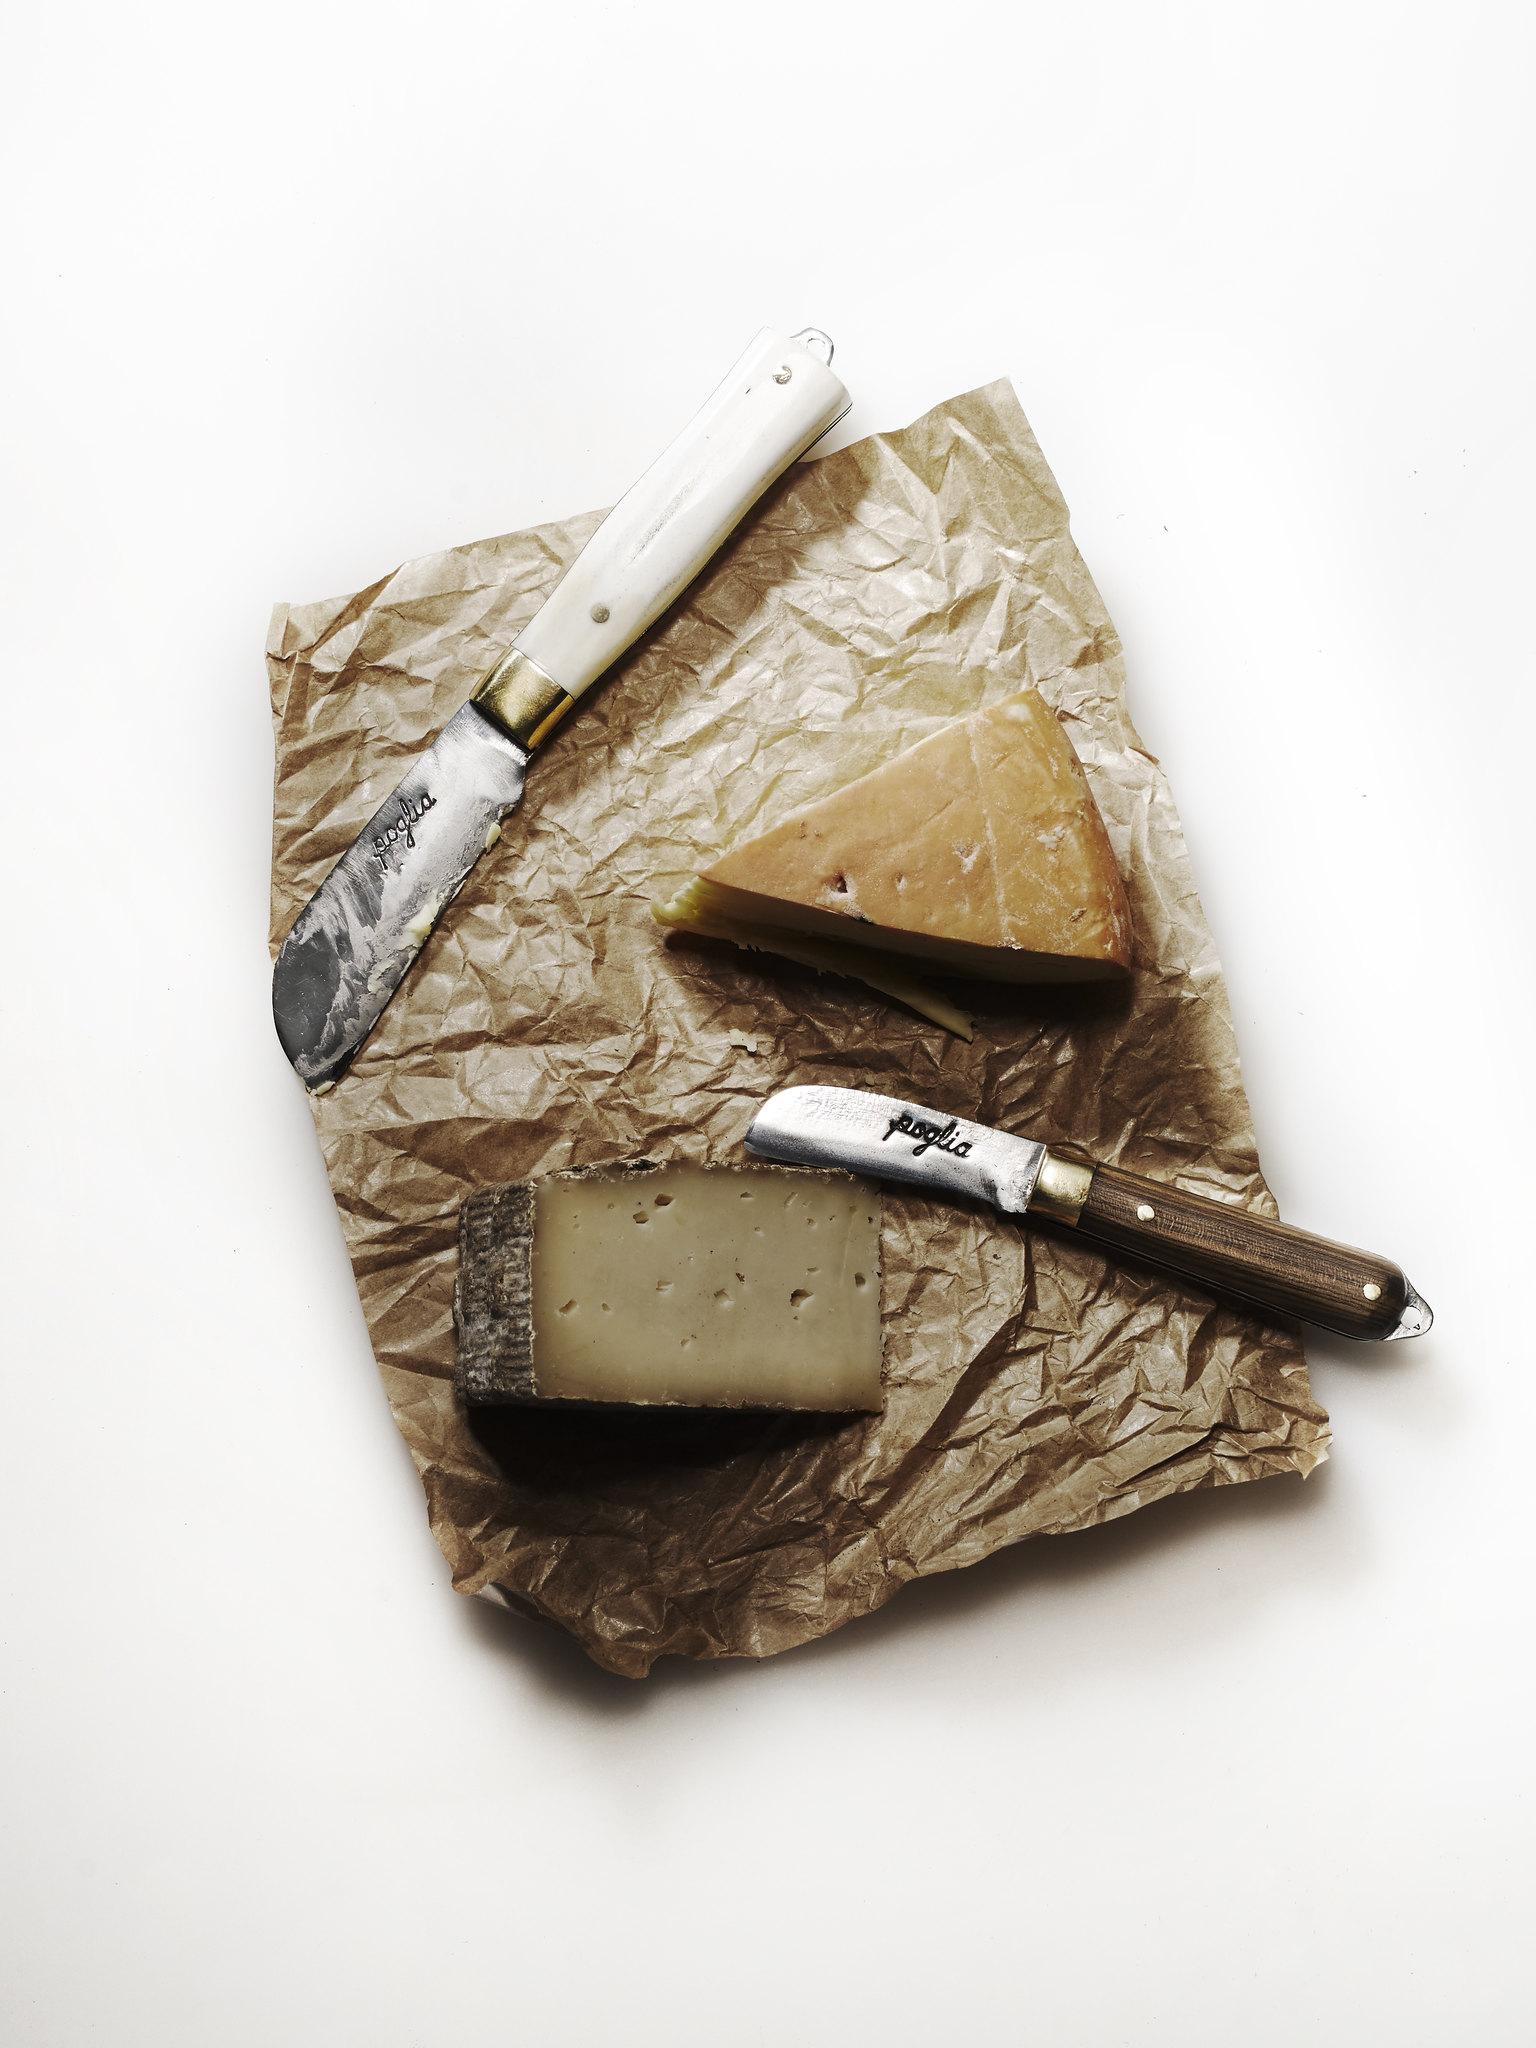 Poglia Cheese.jpg